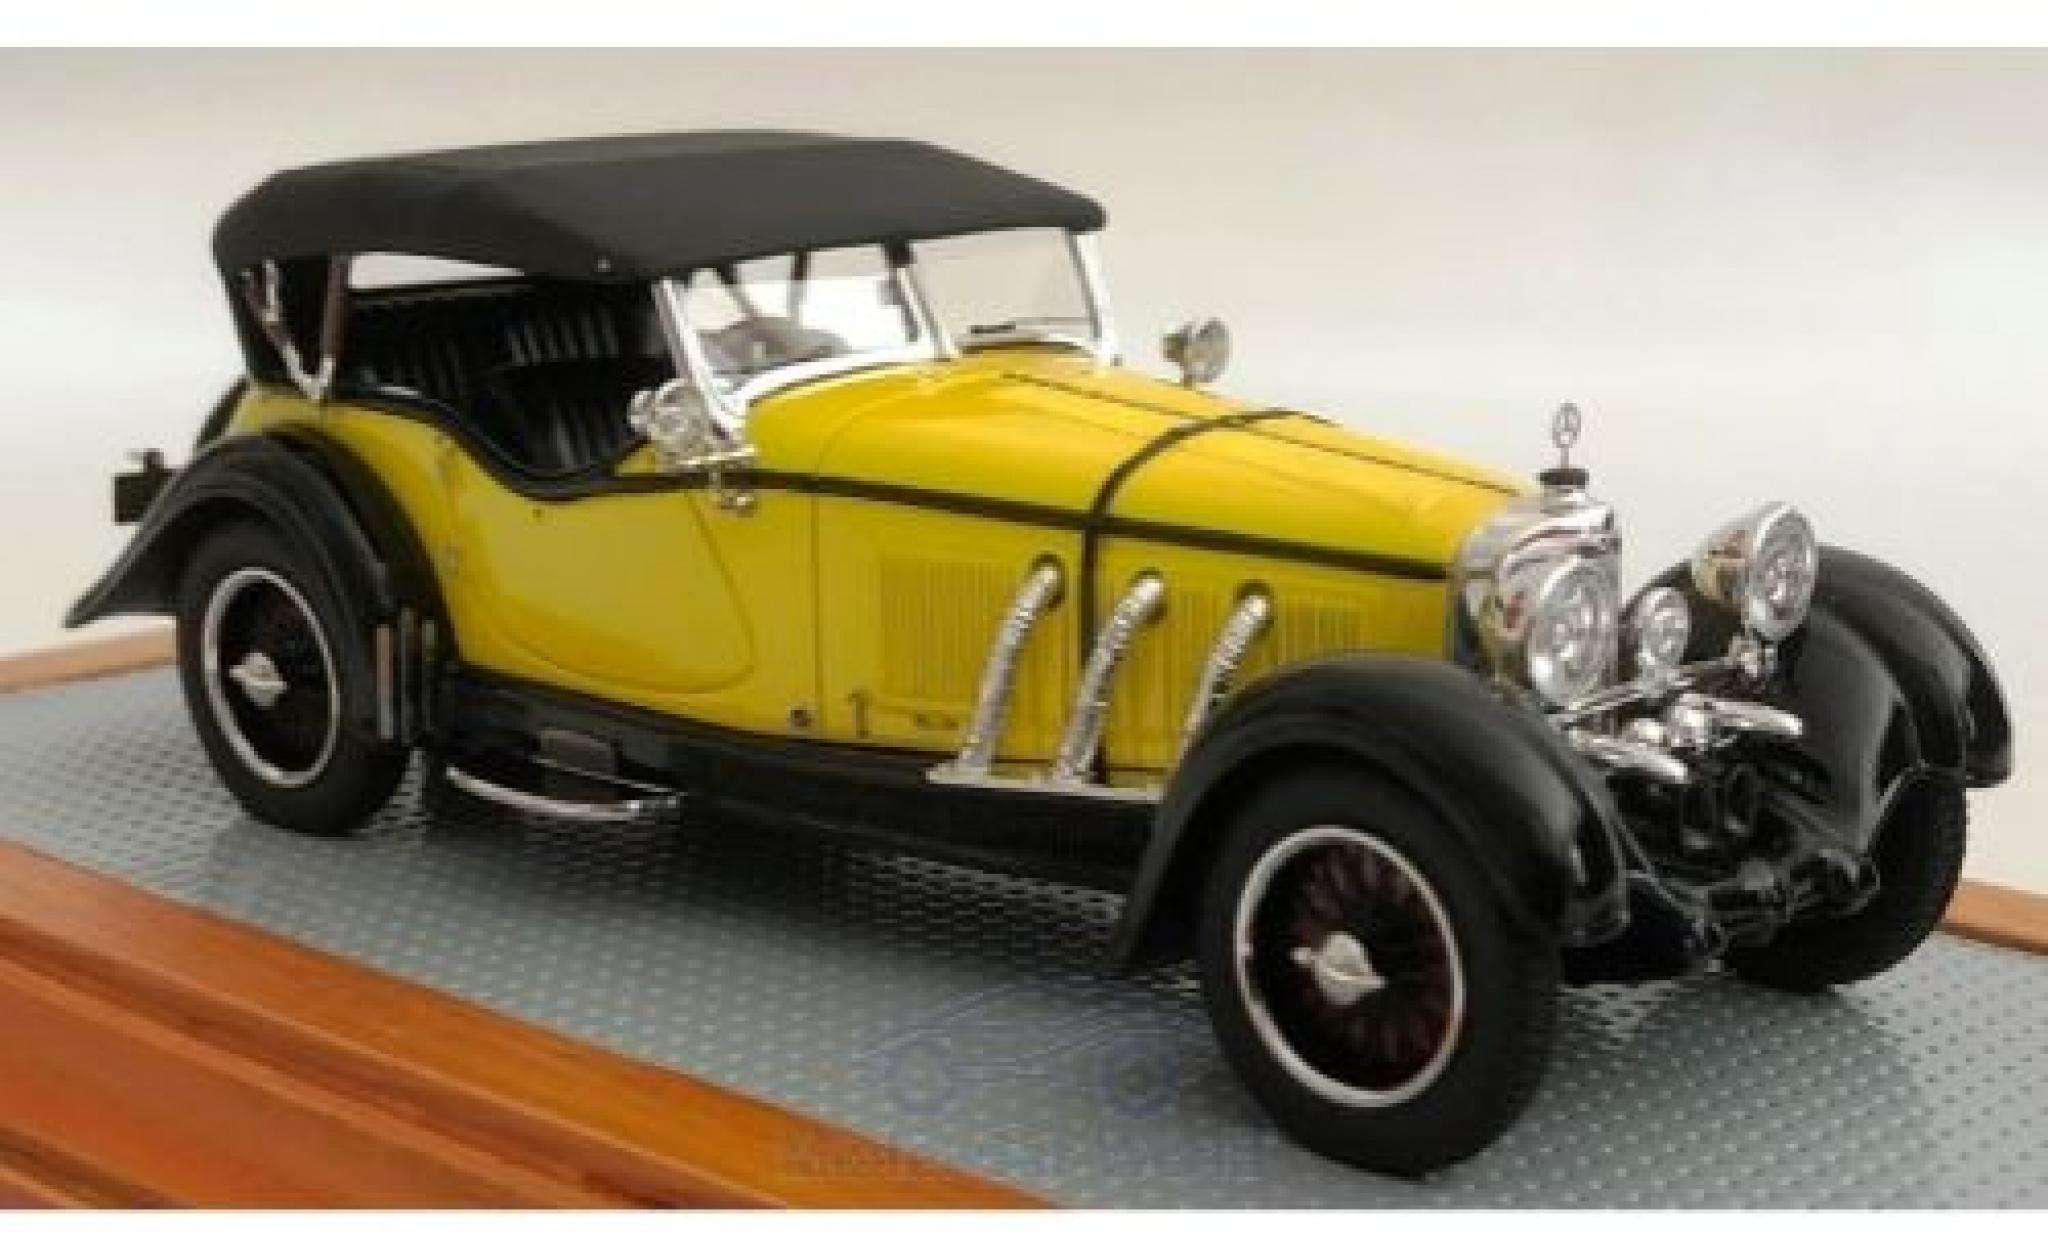 Mercedes Classe GLA 1/43 Ilario S-Type 26/180 Sports Tourer Buhne jaune/noire 1928 sn35920 Gläser